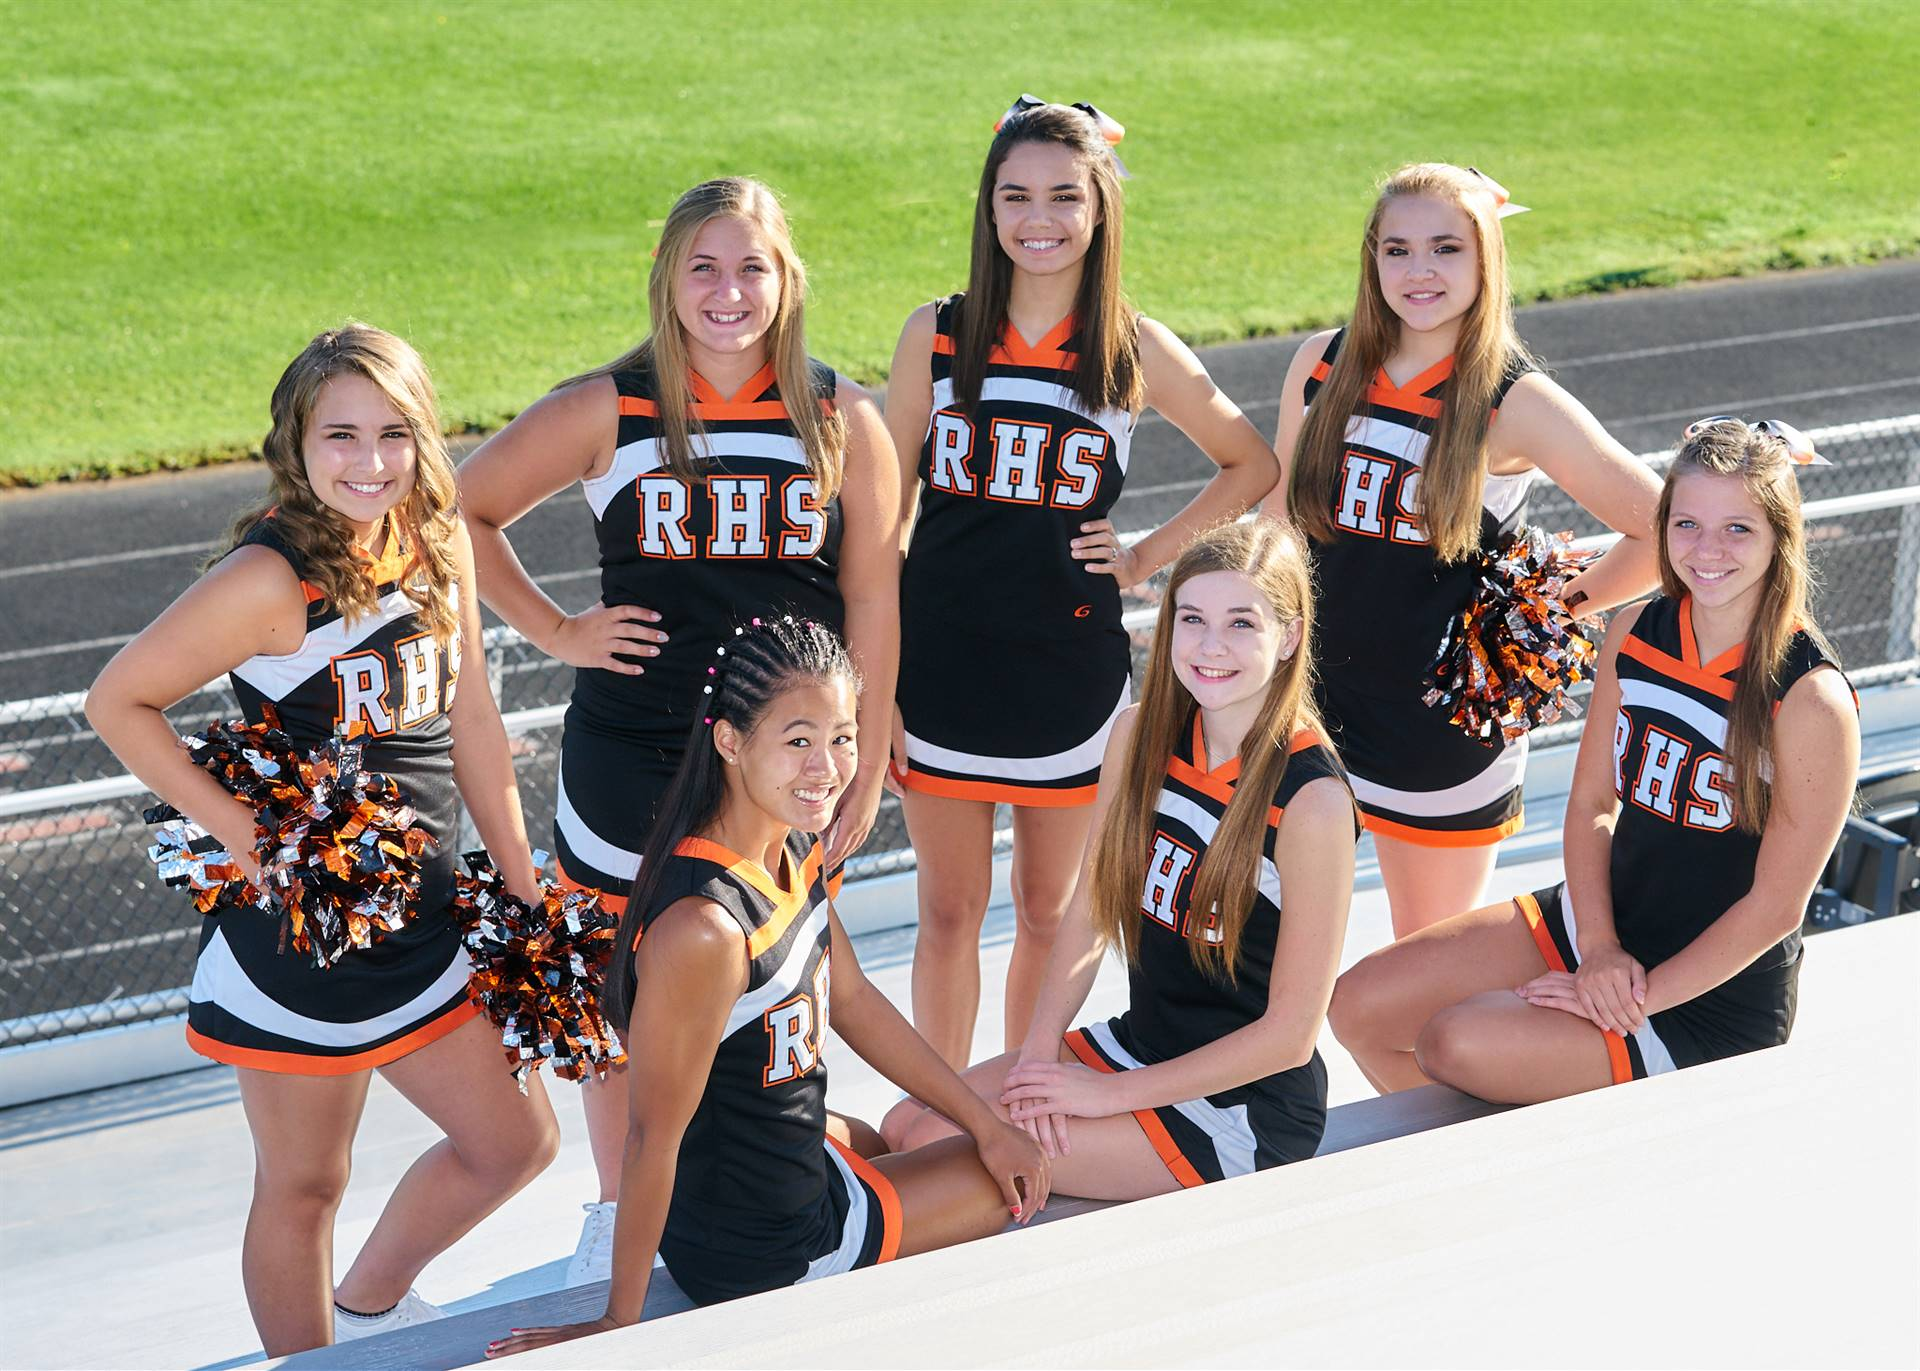 Cheerleaders photo